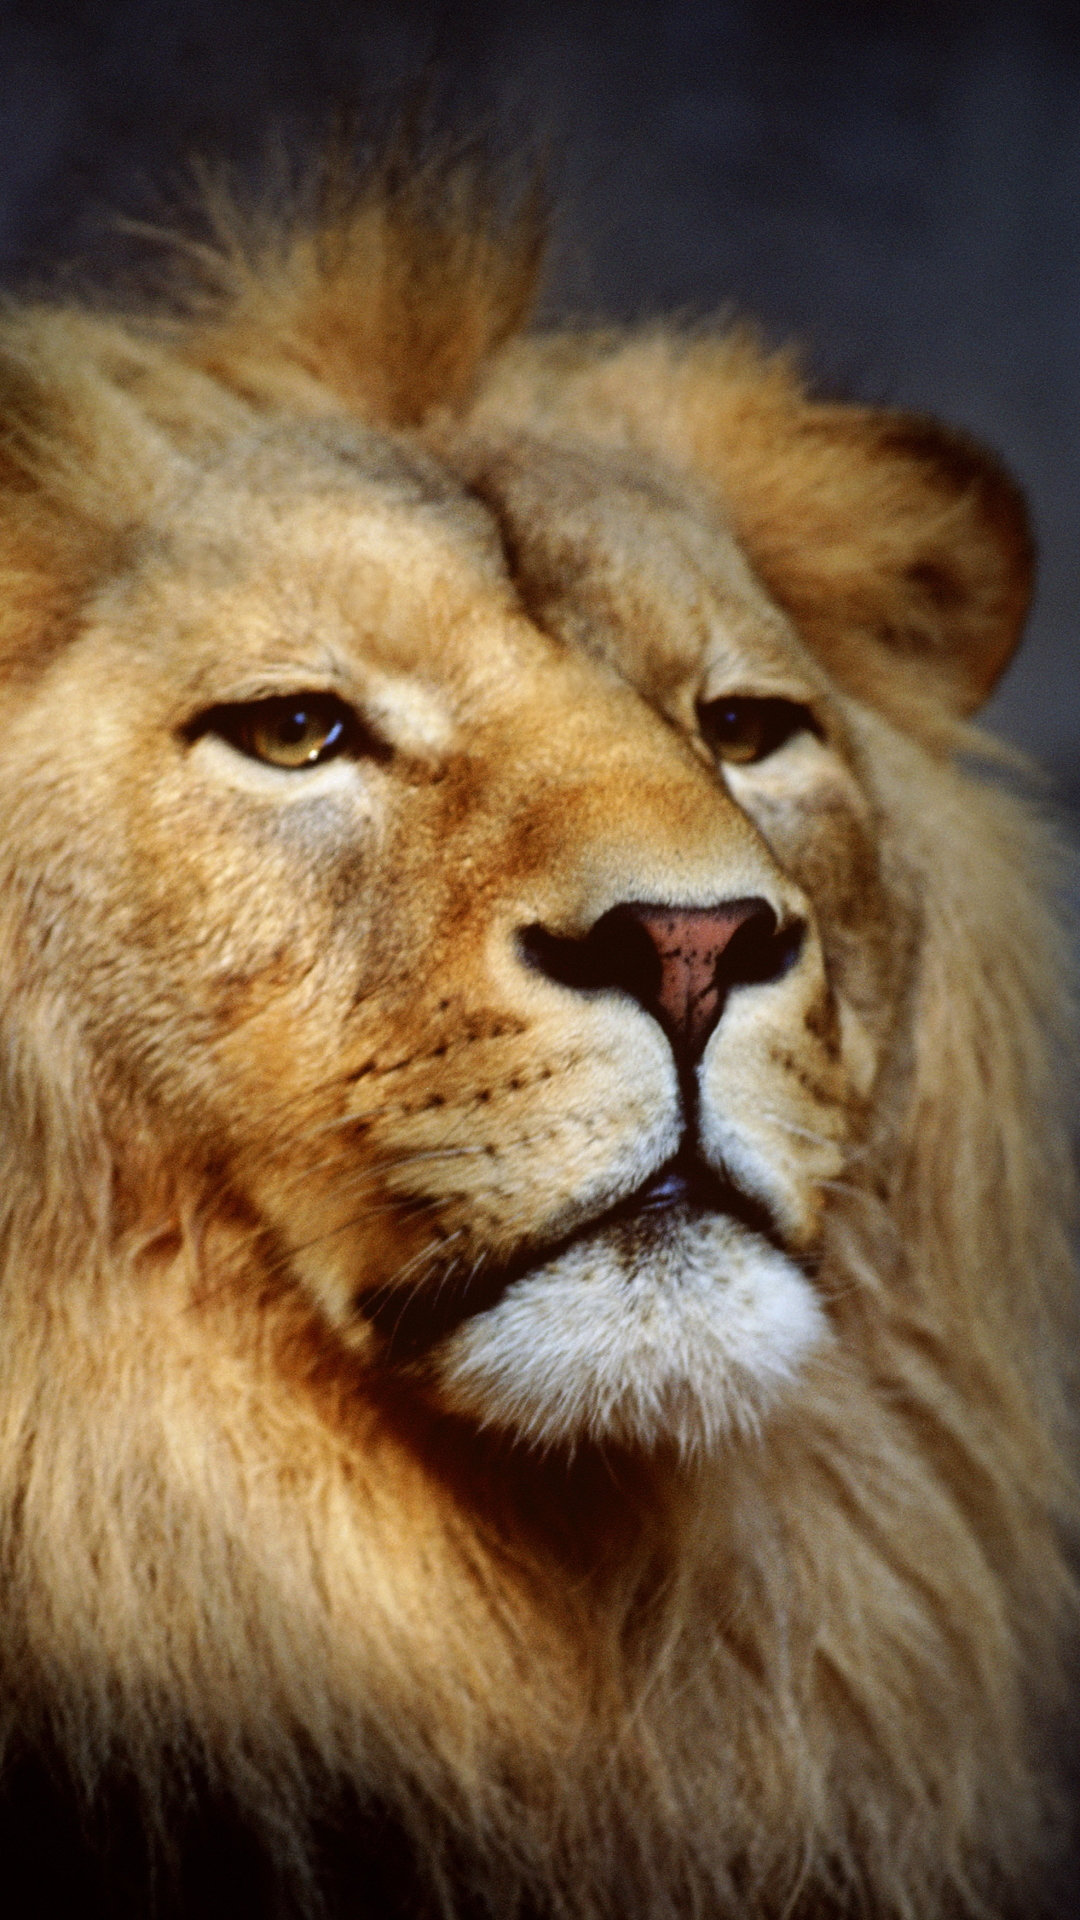 1080x1920 - Animal/Lion - Wallpaper ID: 605615